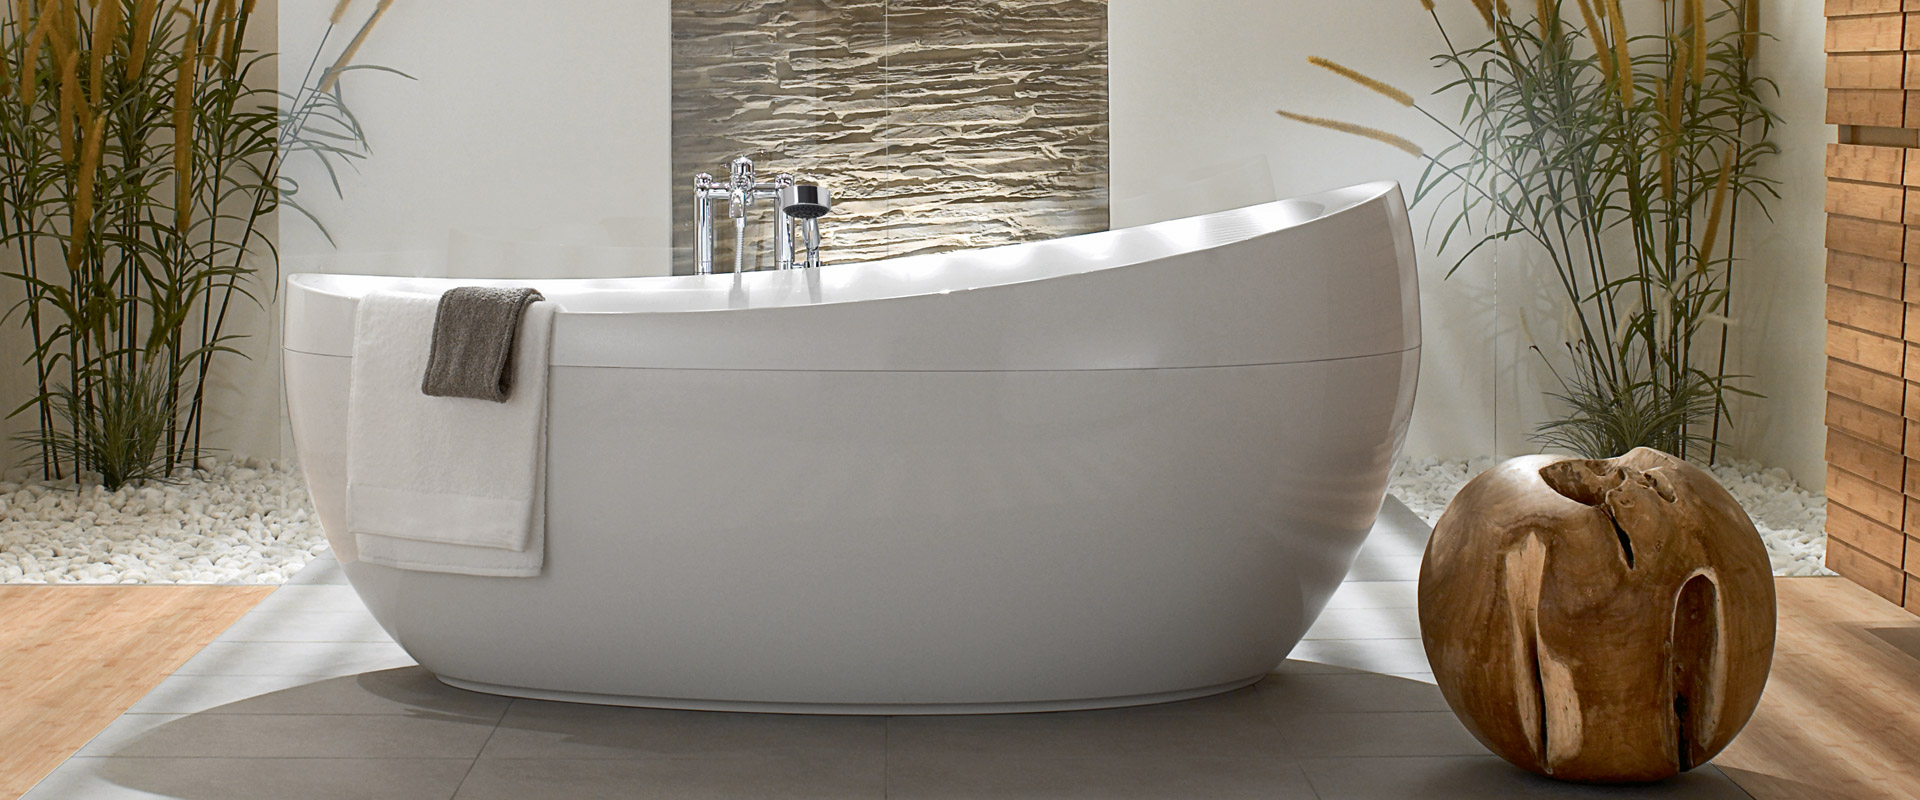 Bathtub & Jacuzzi